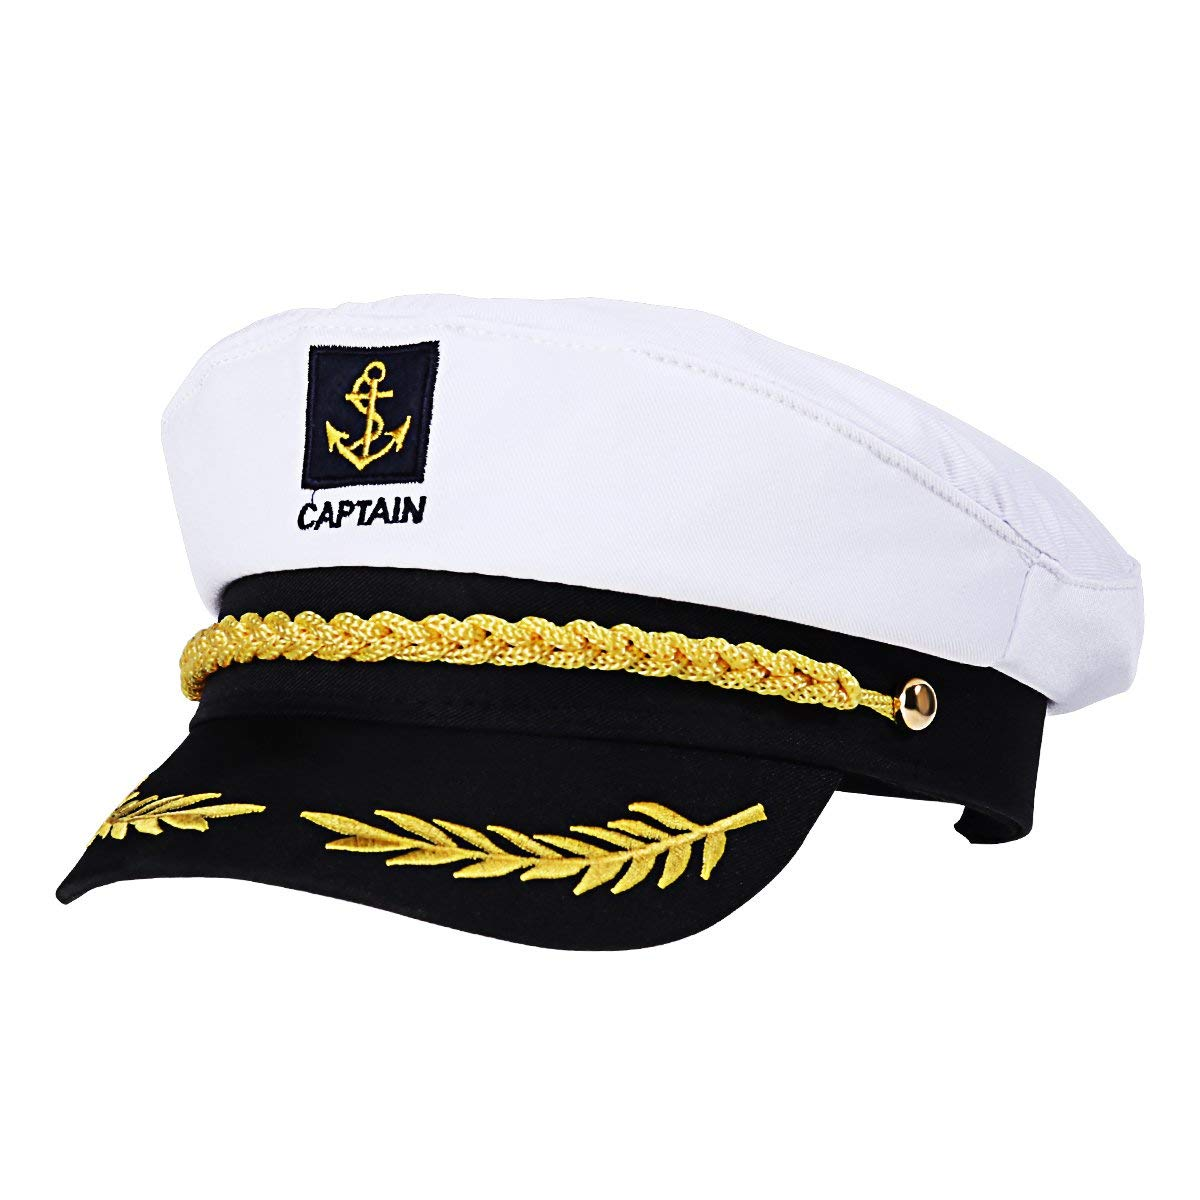 JOCAM Sailor Captain Hat Cap Yacht Party Hats Navy Marine Adult Admiral Sailor Costume Accessories White